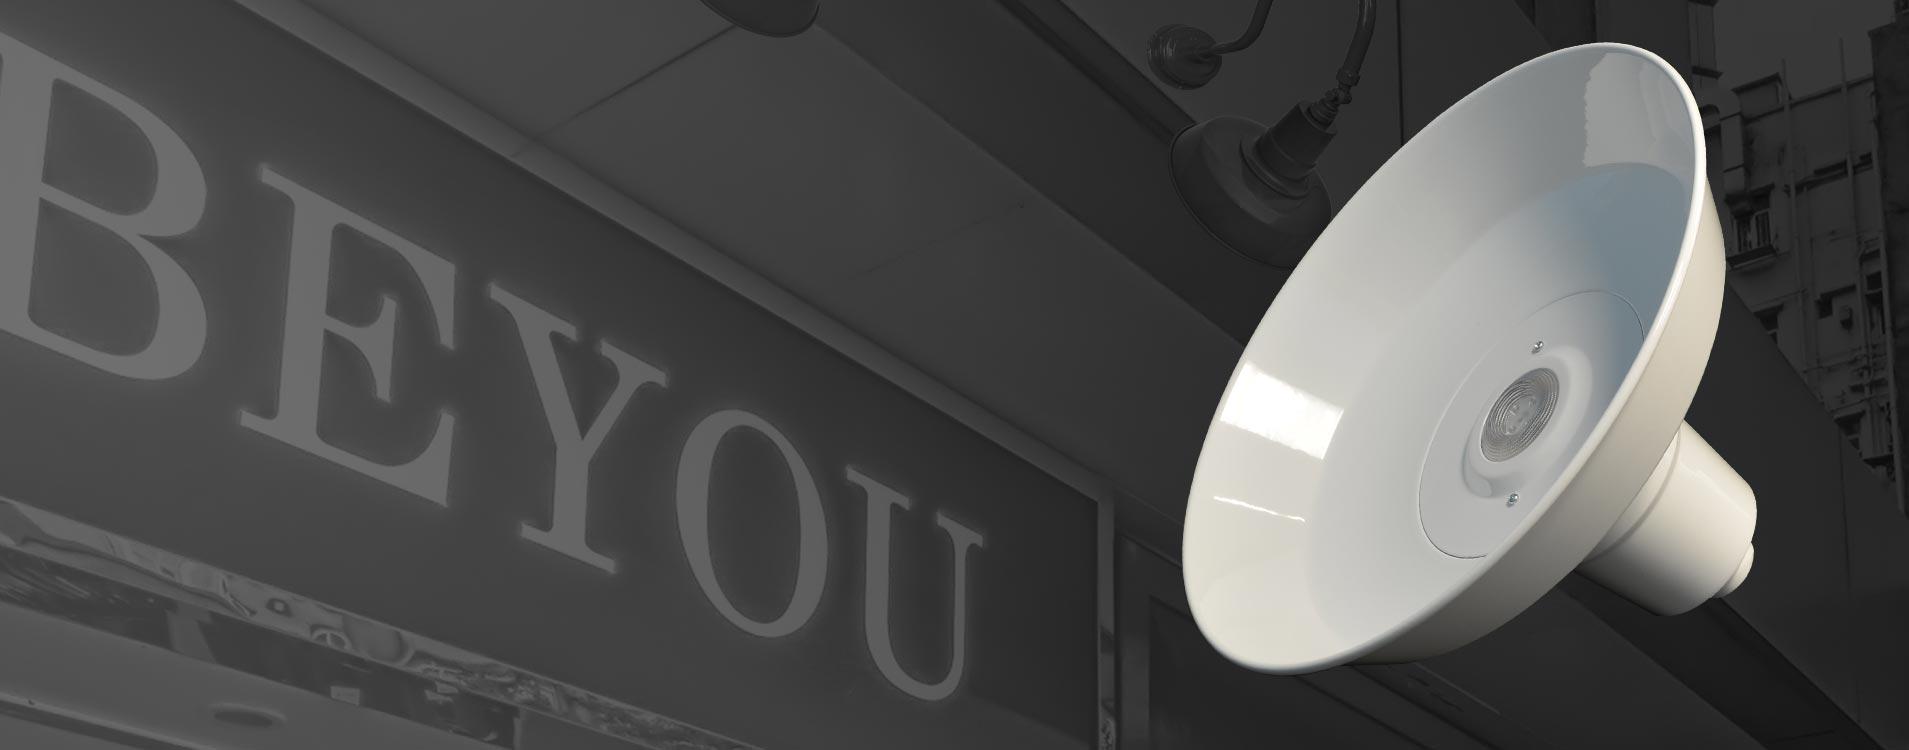 Oldage LED Sign Light weatherproof